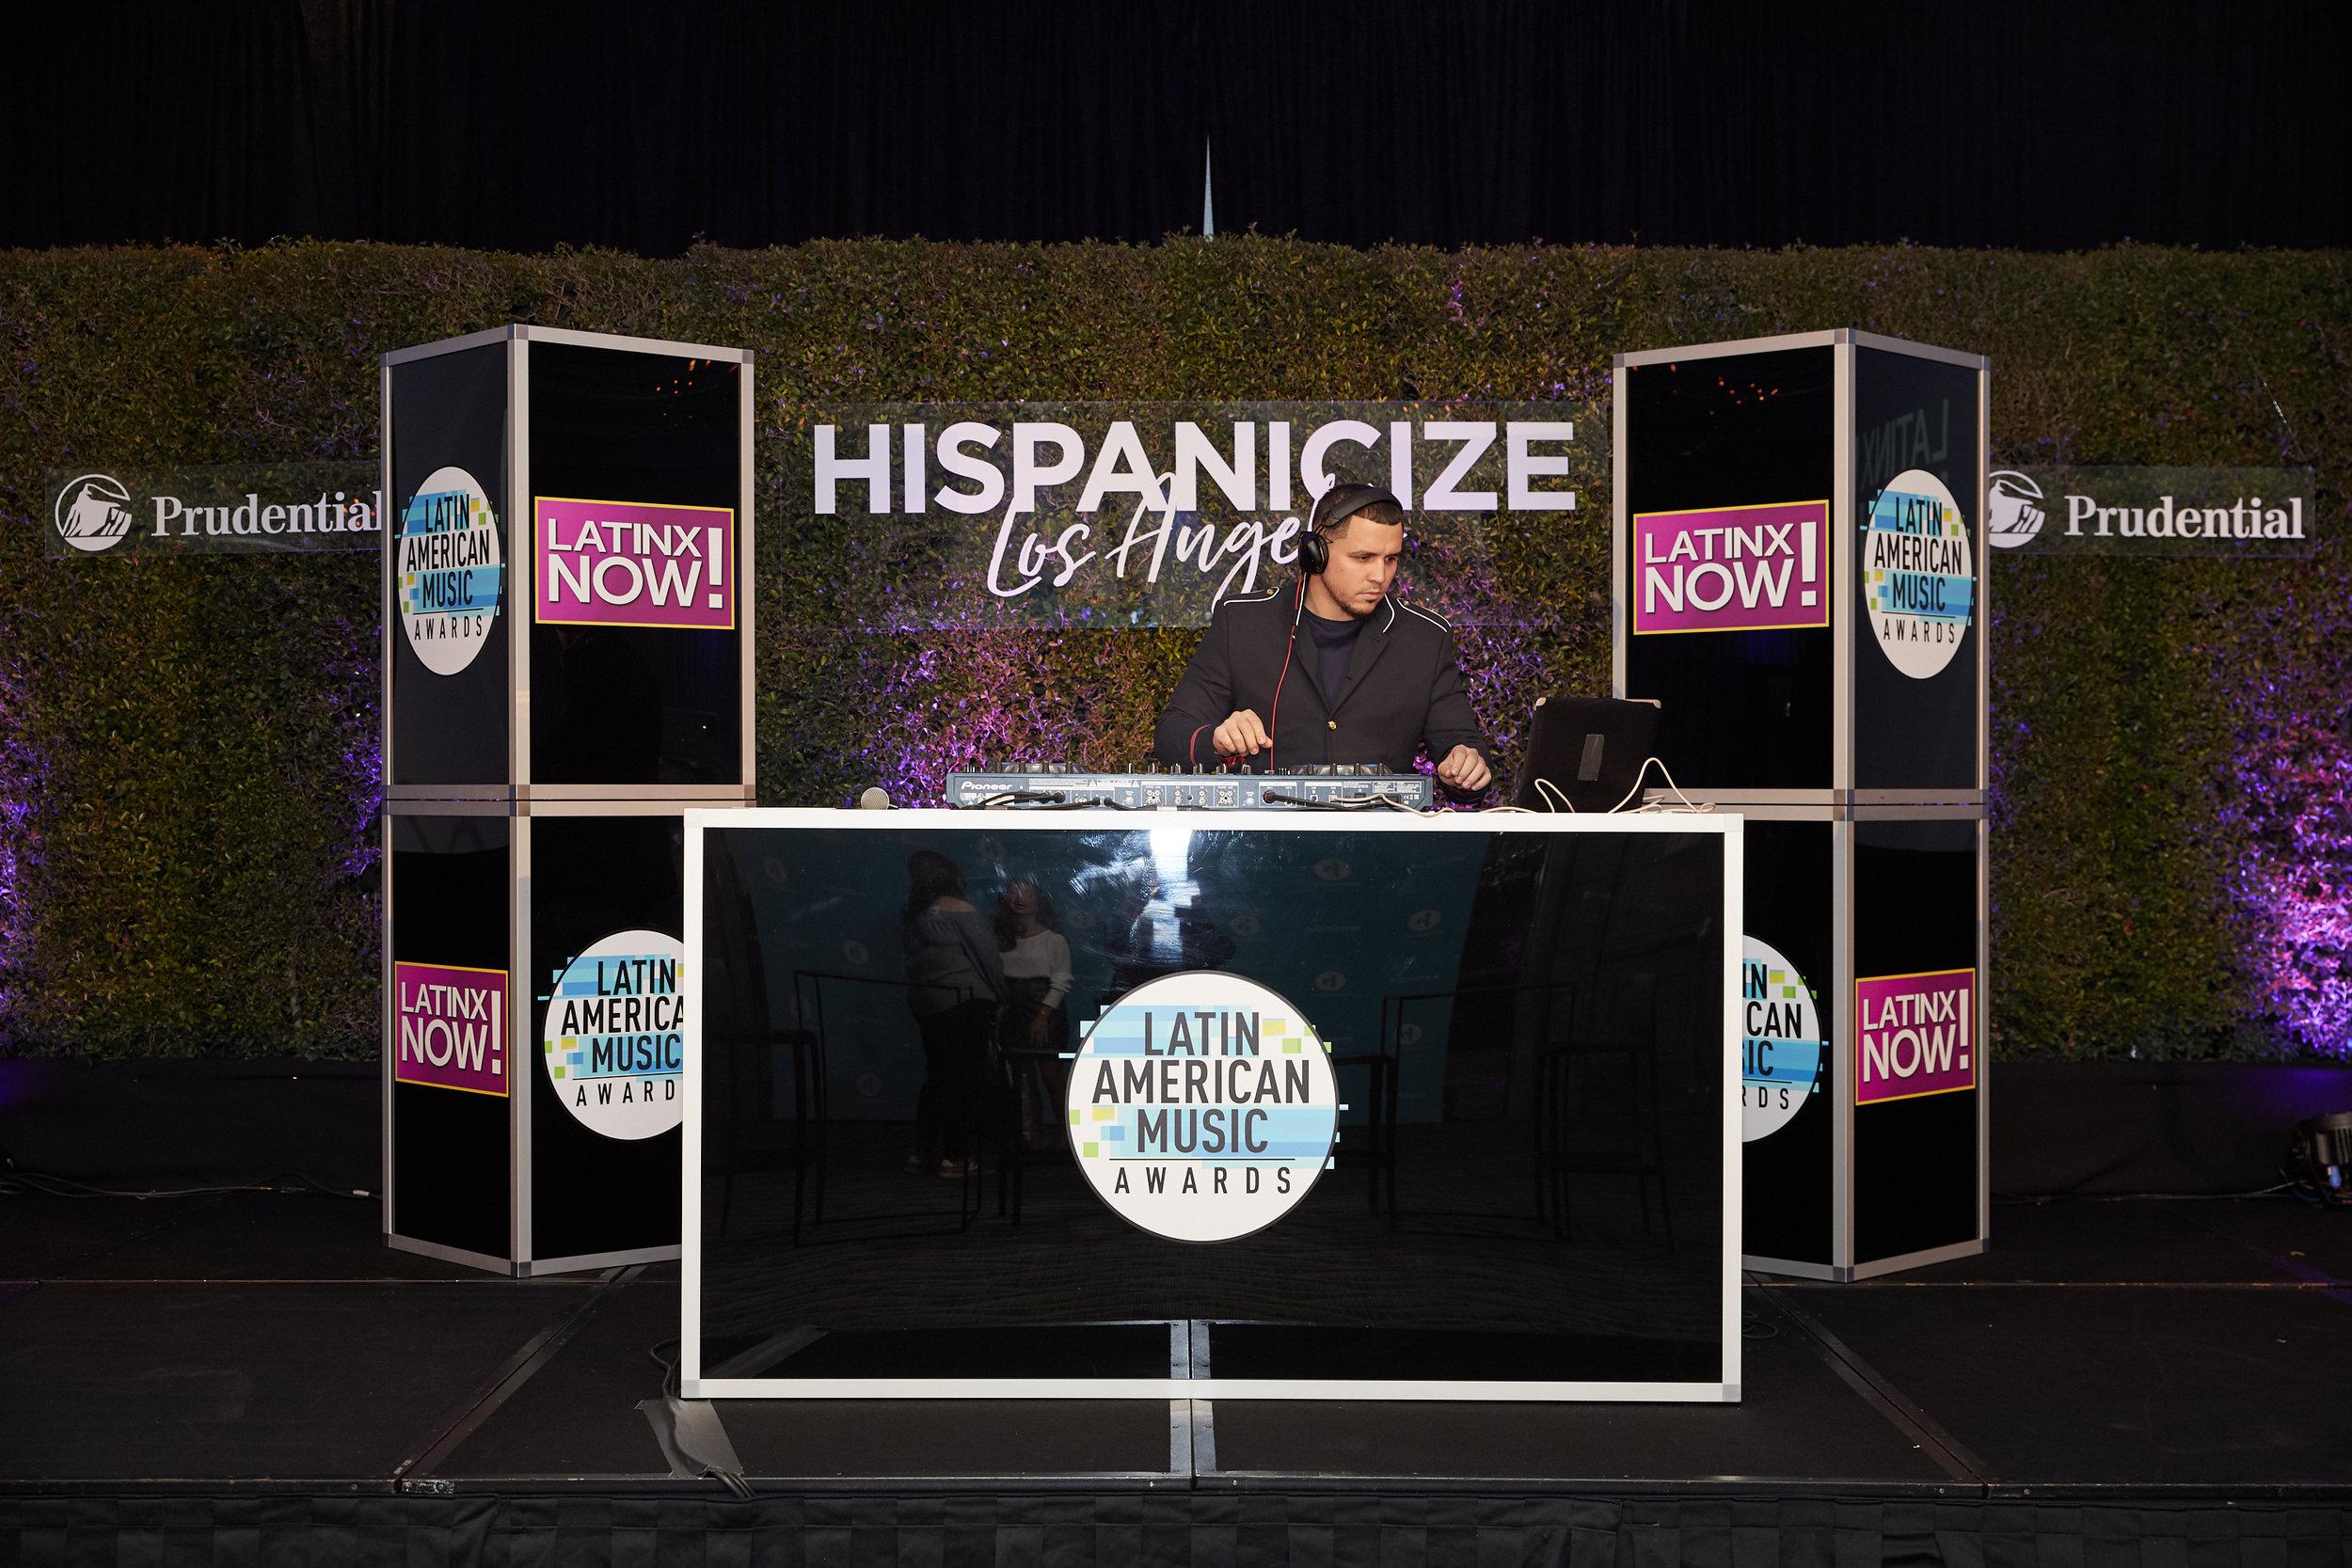 Hispanicize LA_Lauren Alexandra 118.jpg